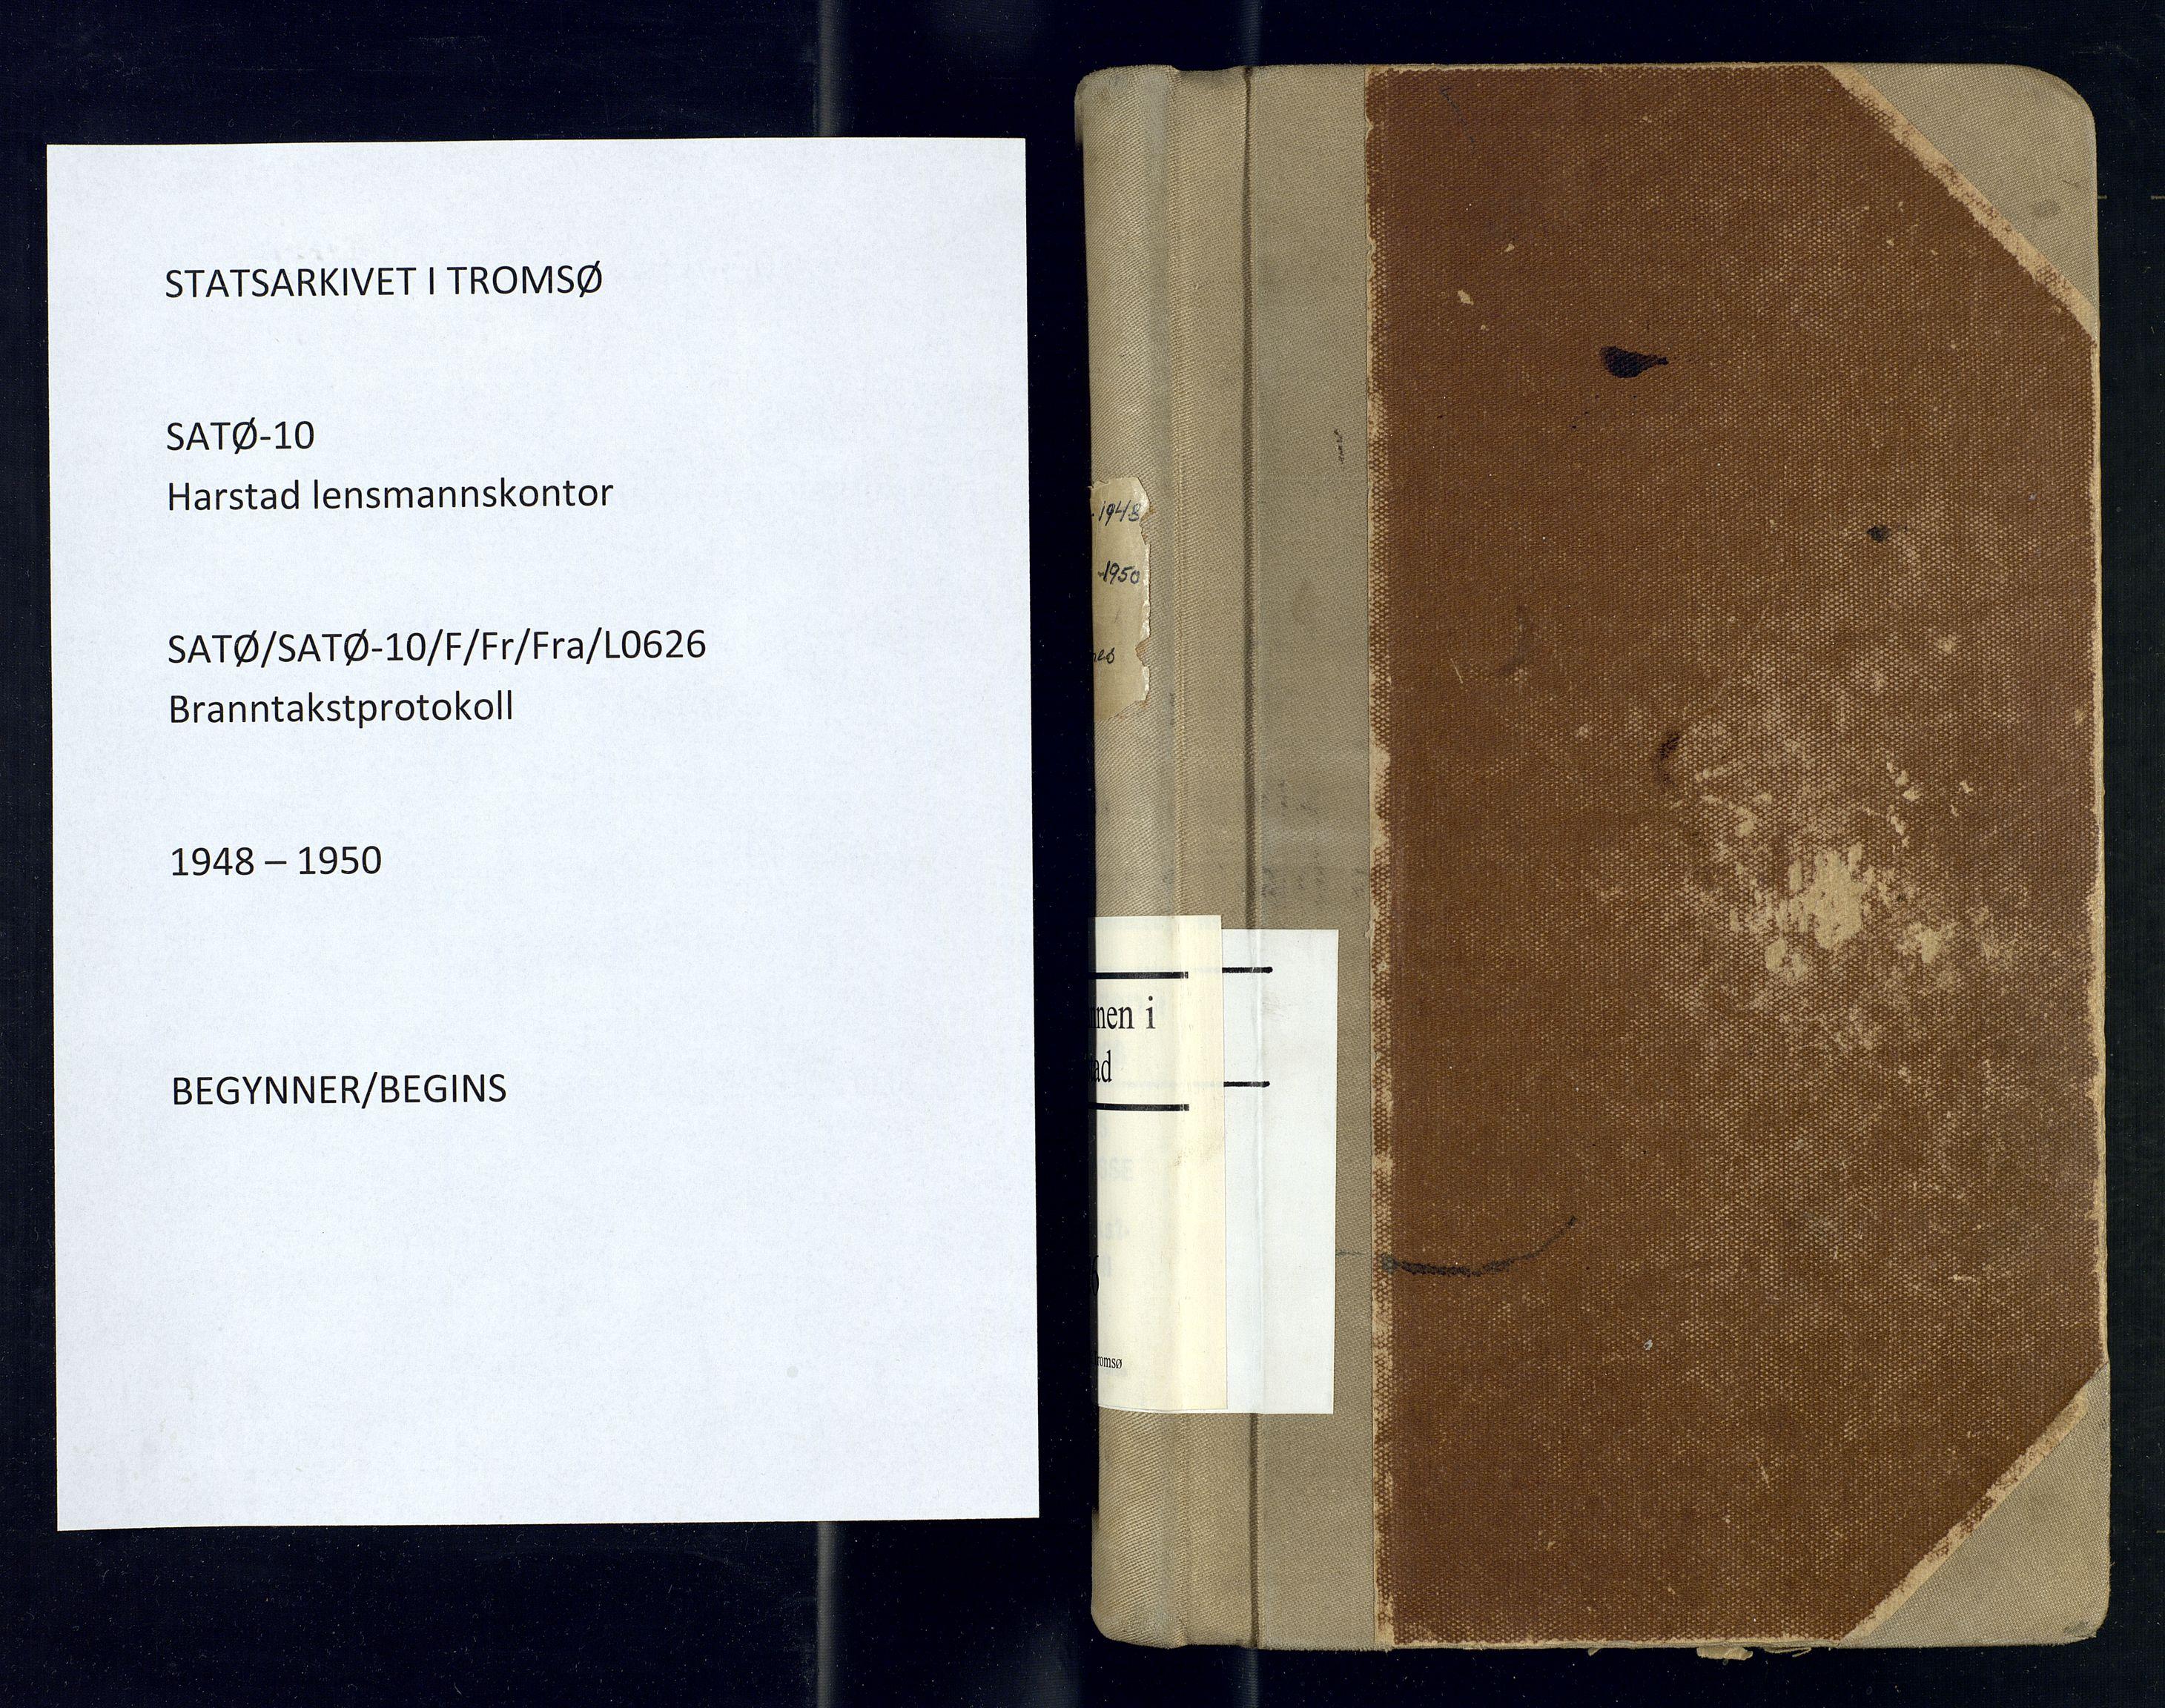 SATØ, Harstad lensmannskontor, F/Fr/Fra/L0626: Branntakstprotokoll, 1948-1950